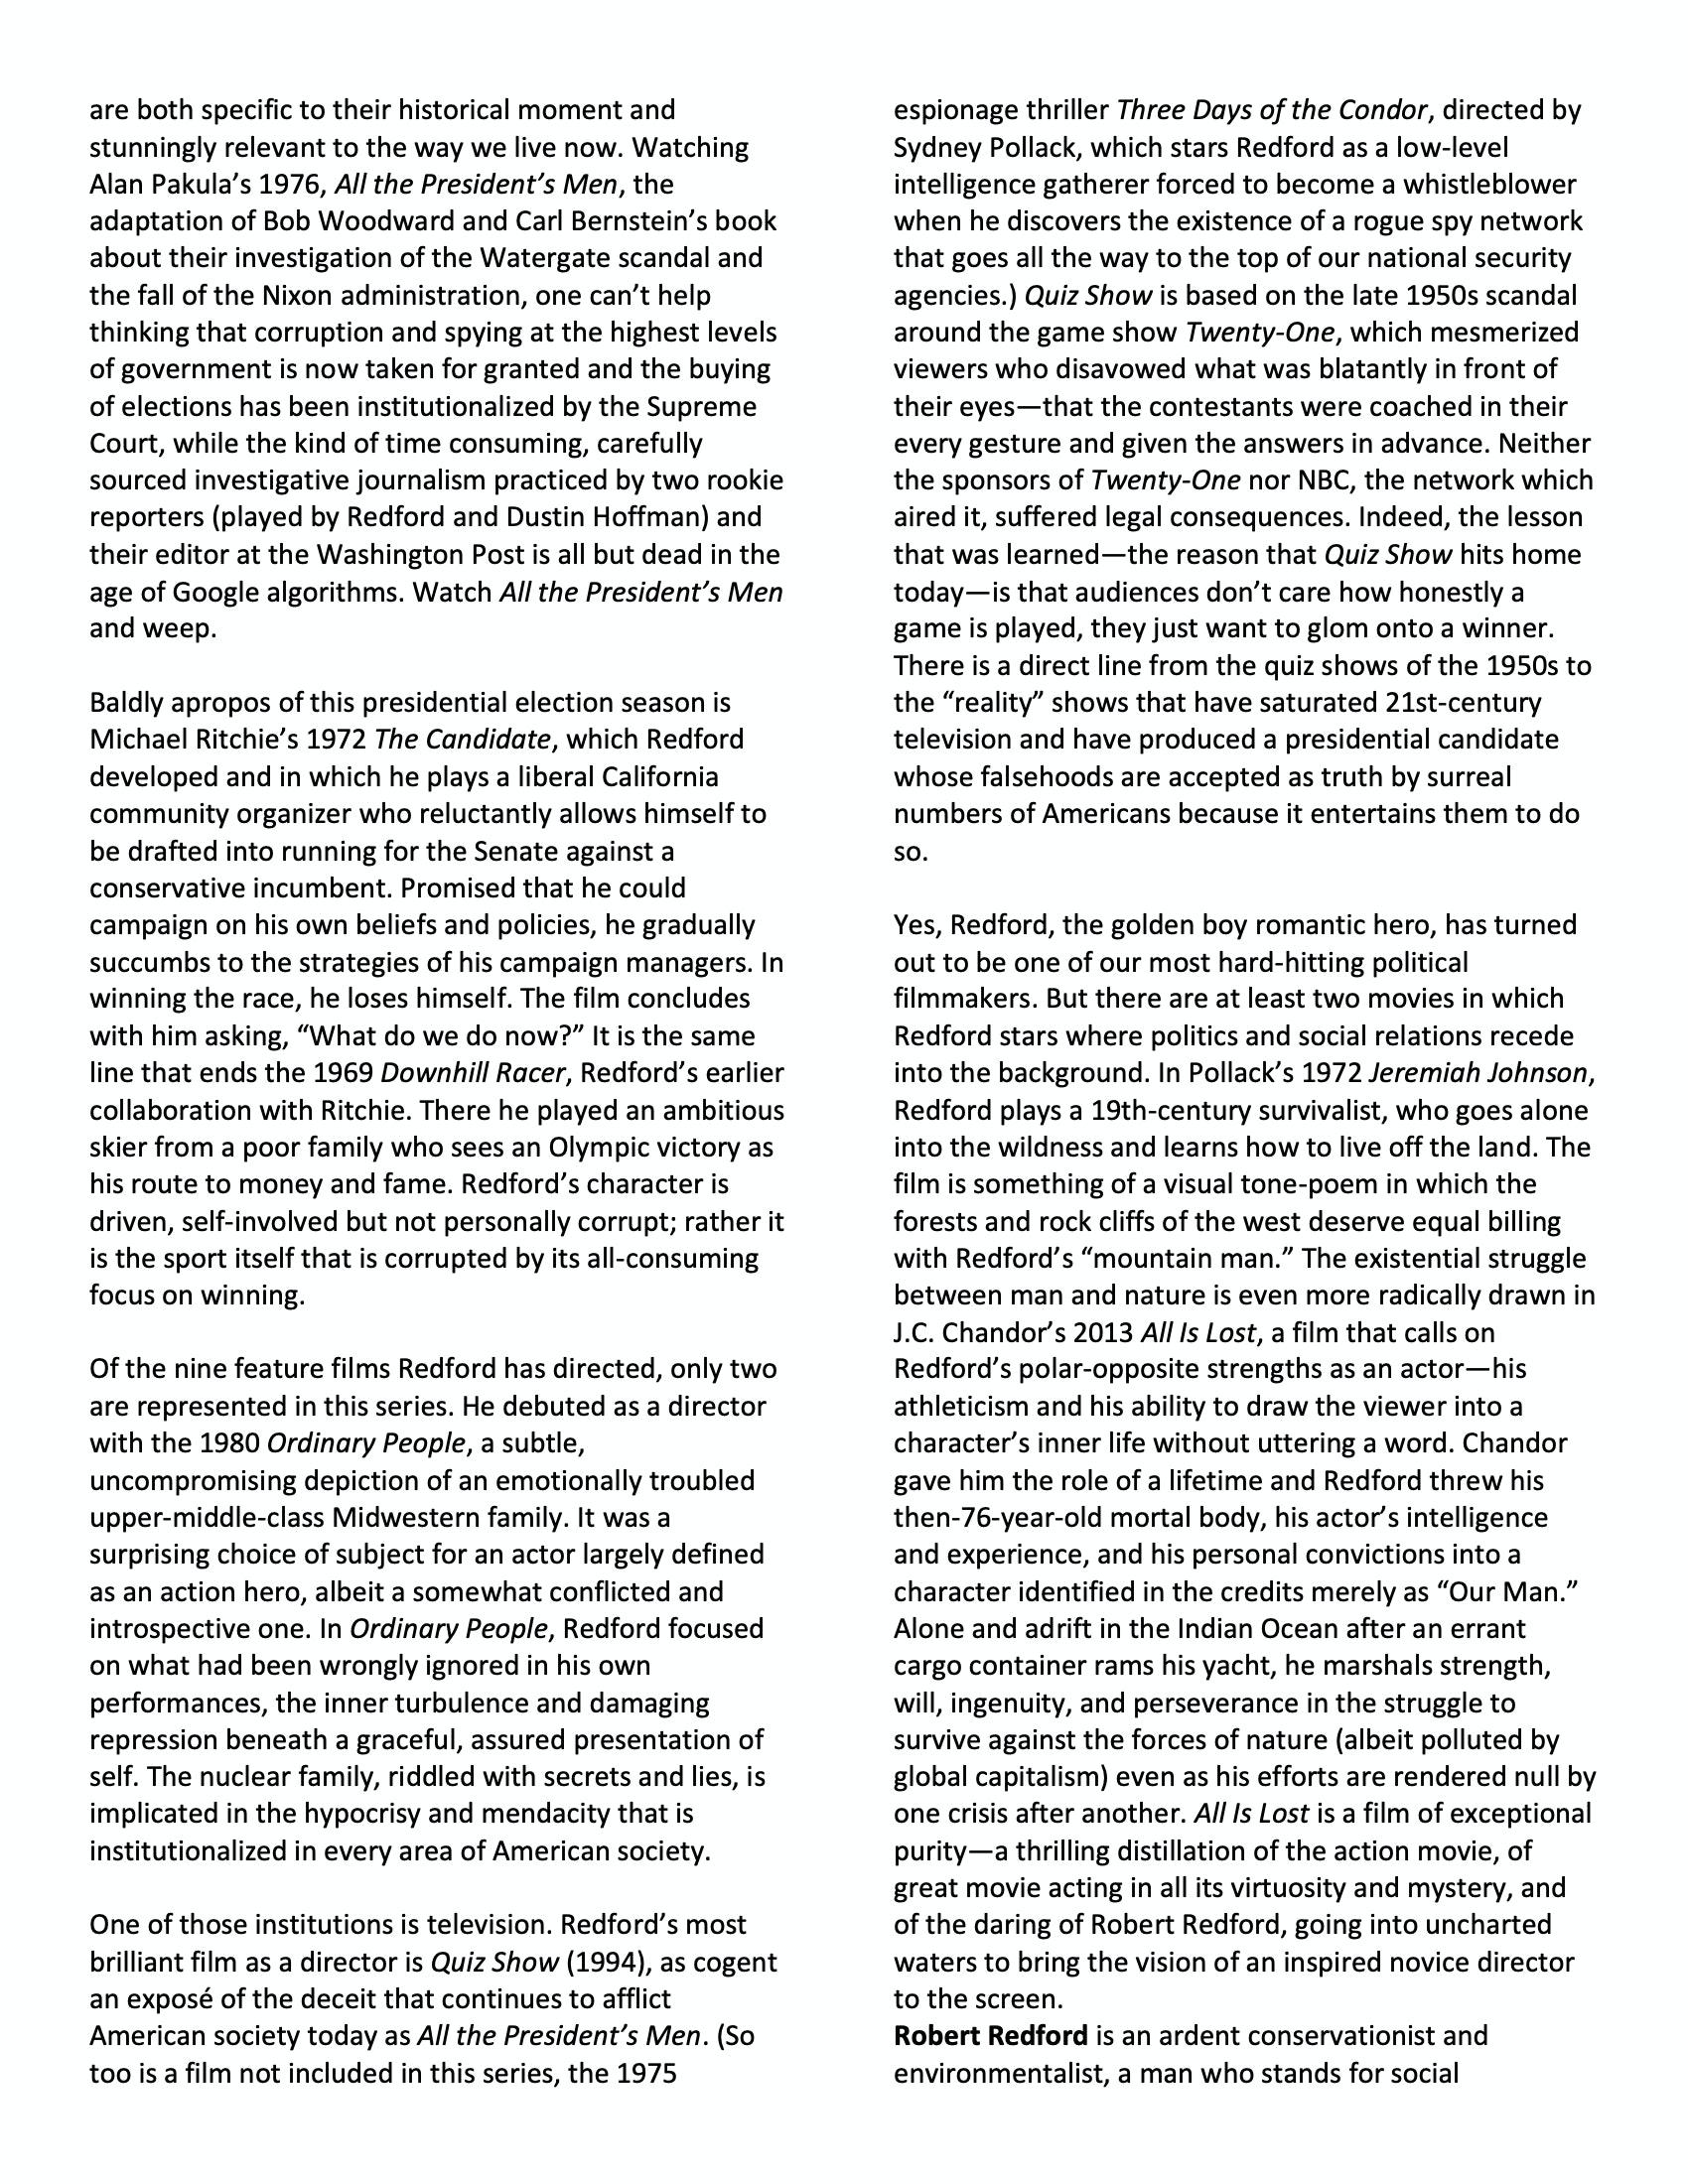 Robert Redford program notes pg 3